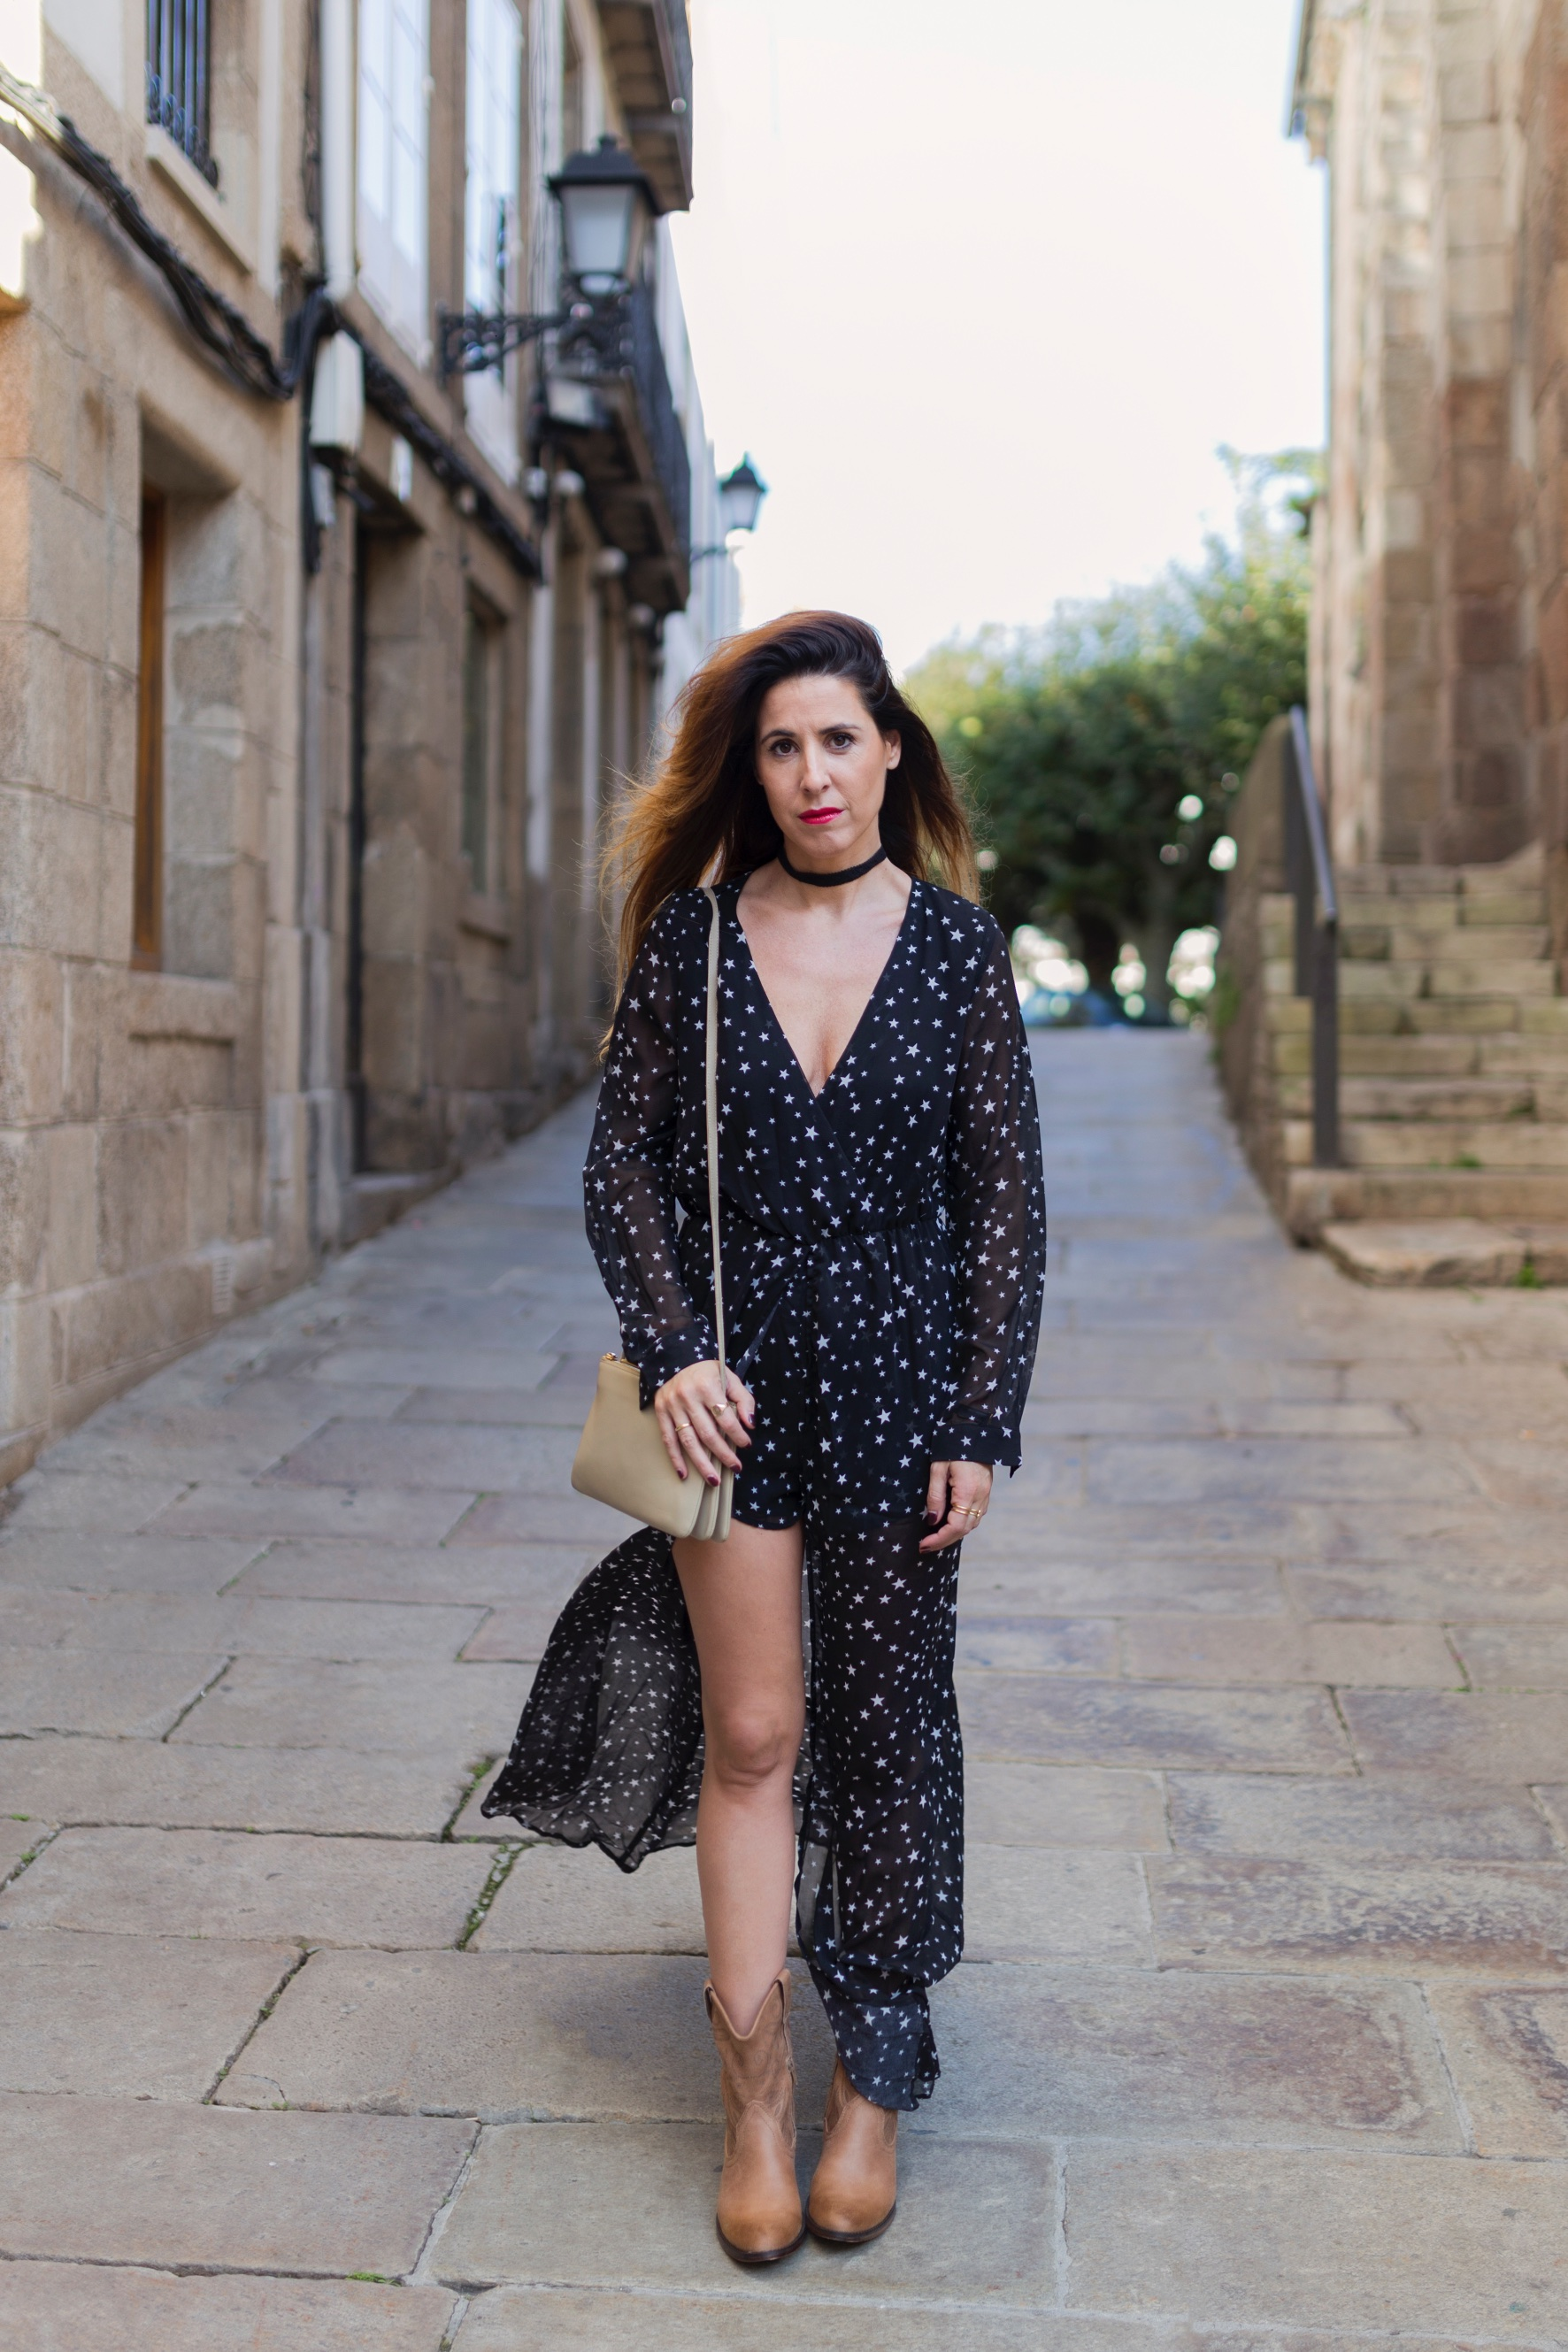 shein-dress-fashion-blogger-descalzaporelparque